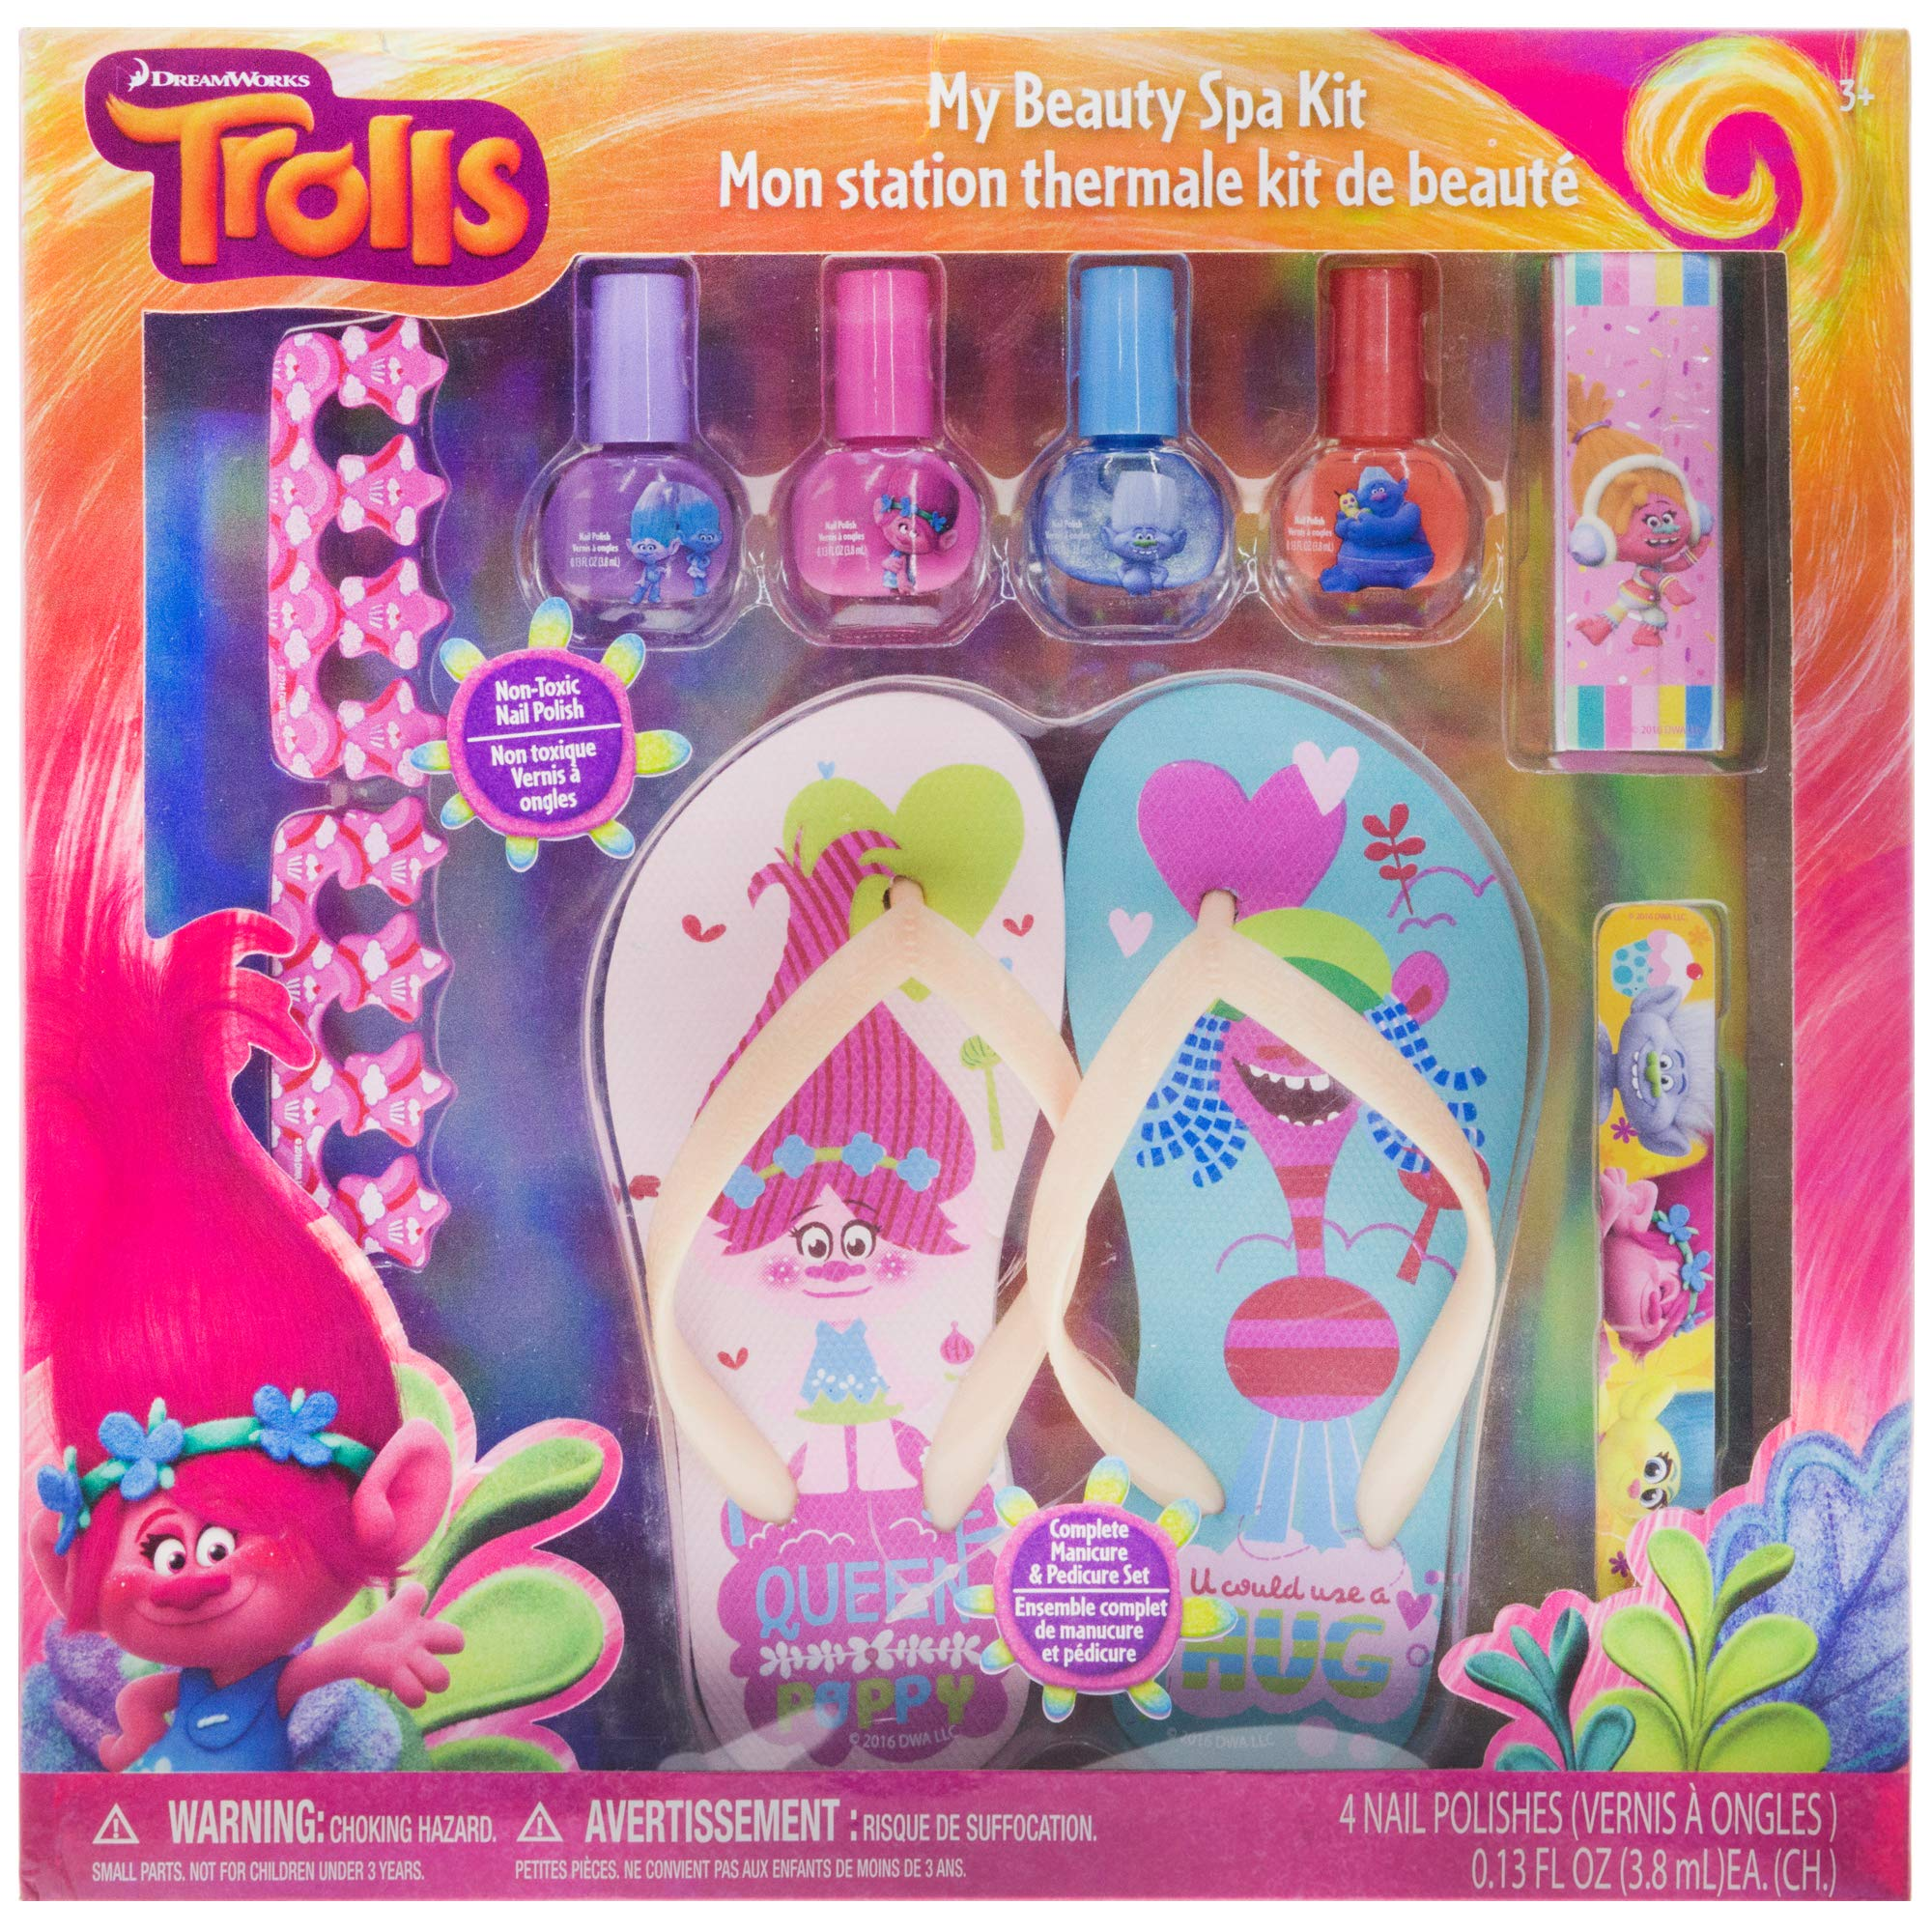 Townley Girl DreamWorks Trolls My Beauty Spa Set Polish, Buffer, File, Sandals and Toe Separators, 10 Piece Set